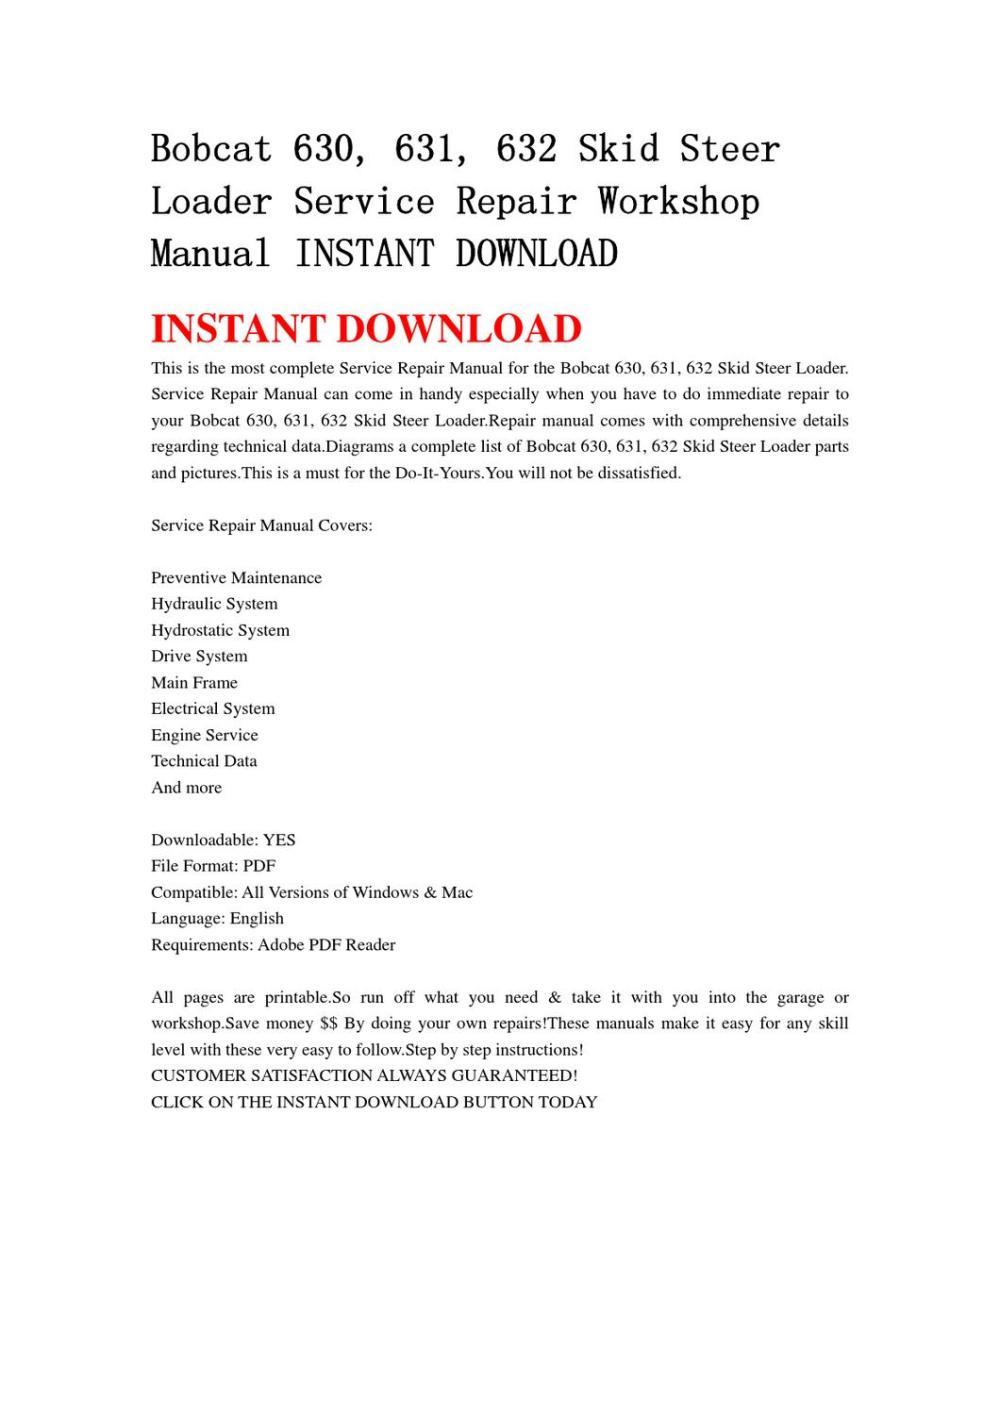 medium resolution of bobcat 630 631 632 skid steer loader service repair workshop manual instant download by qin wanga issuu